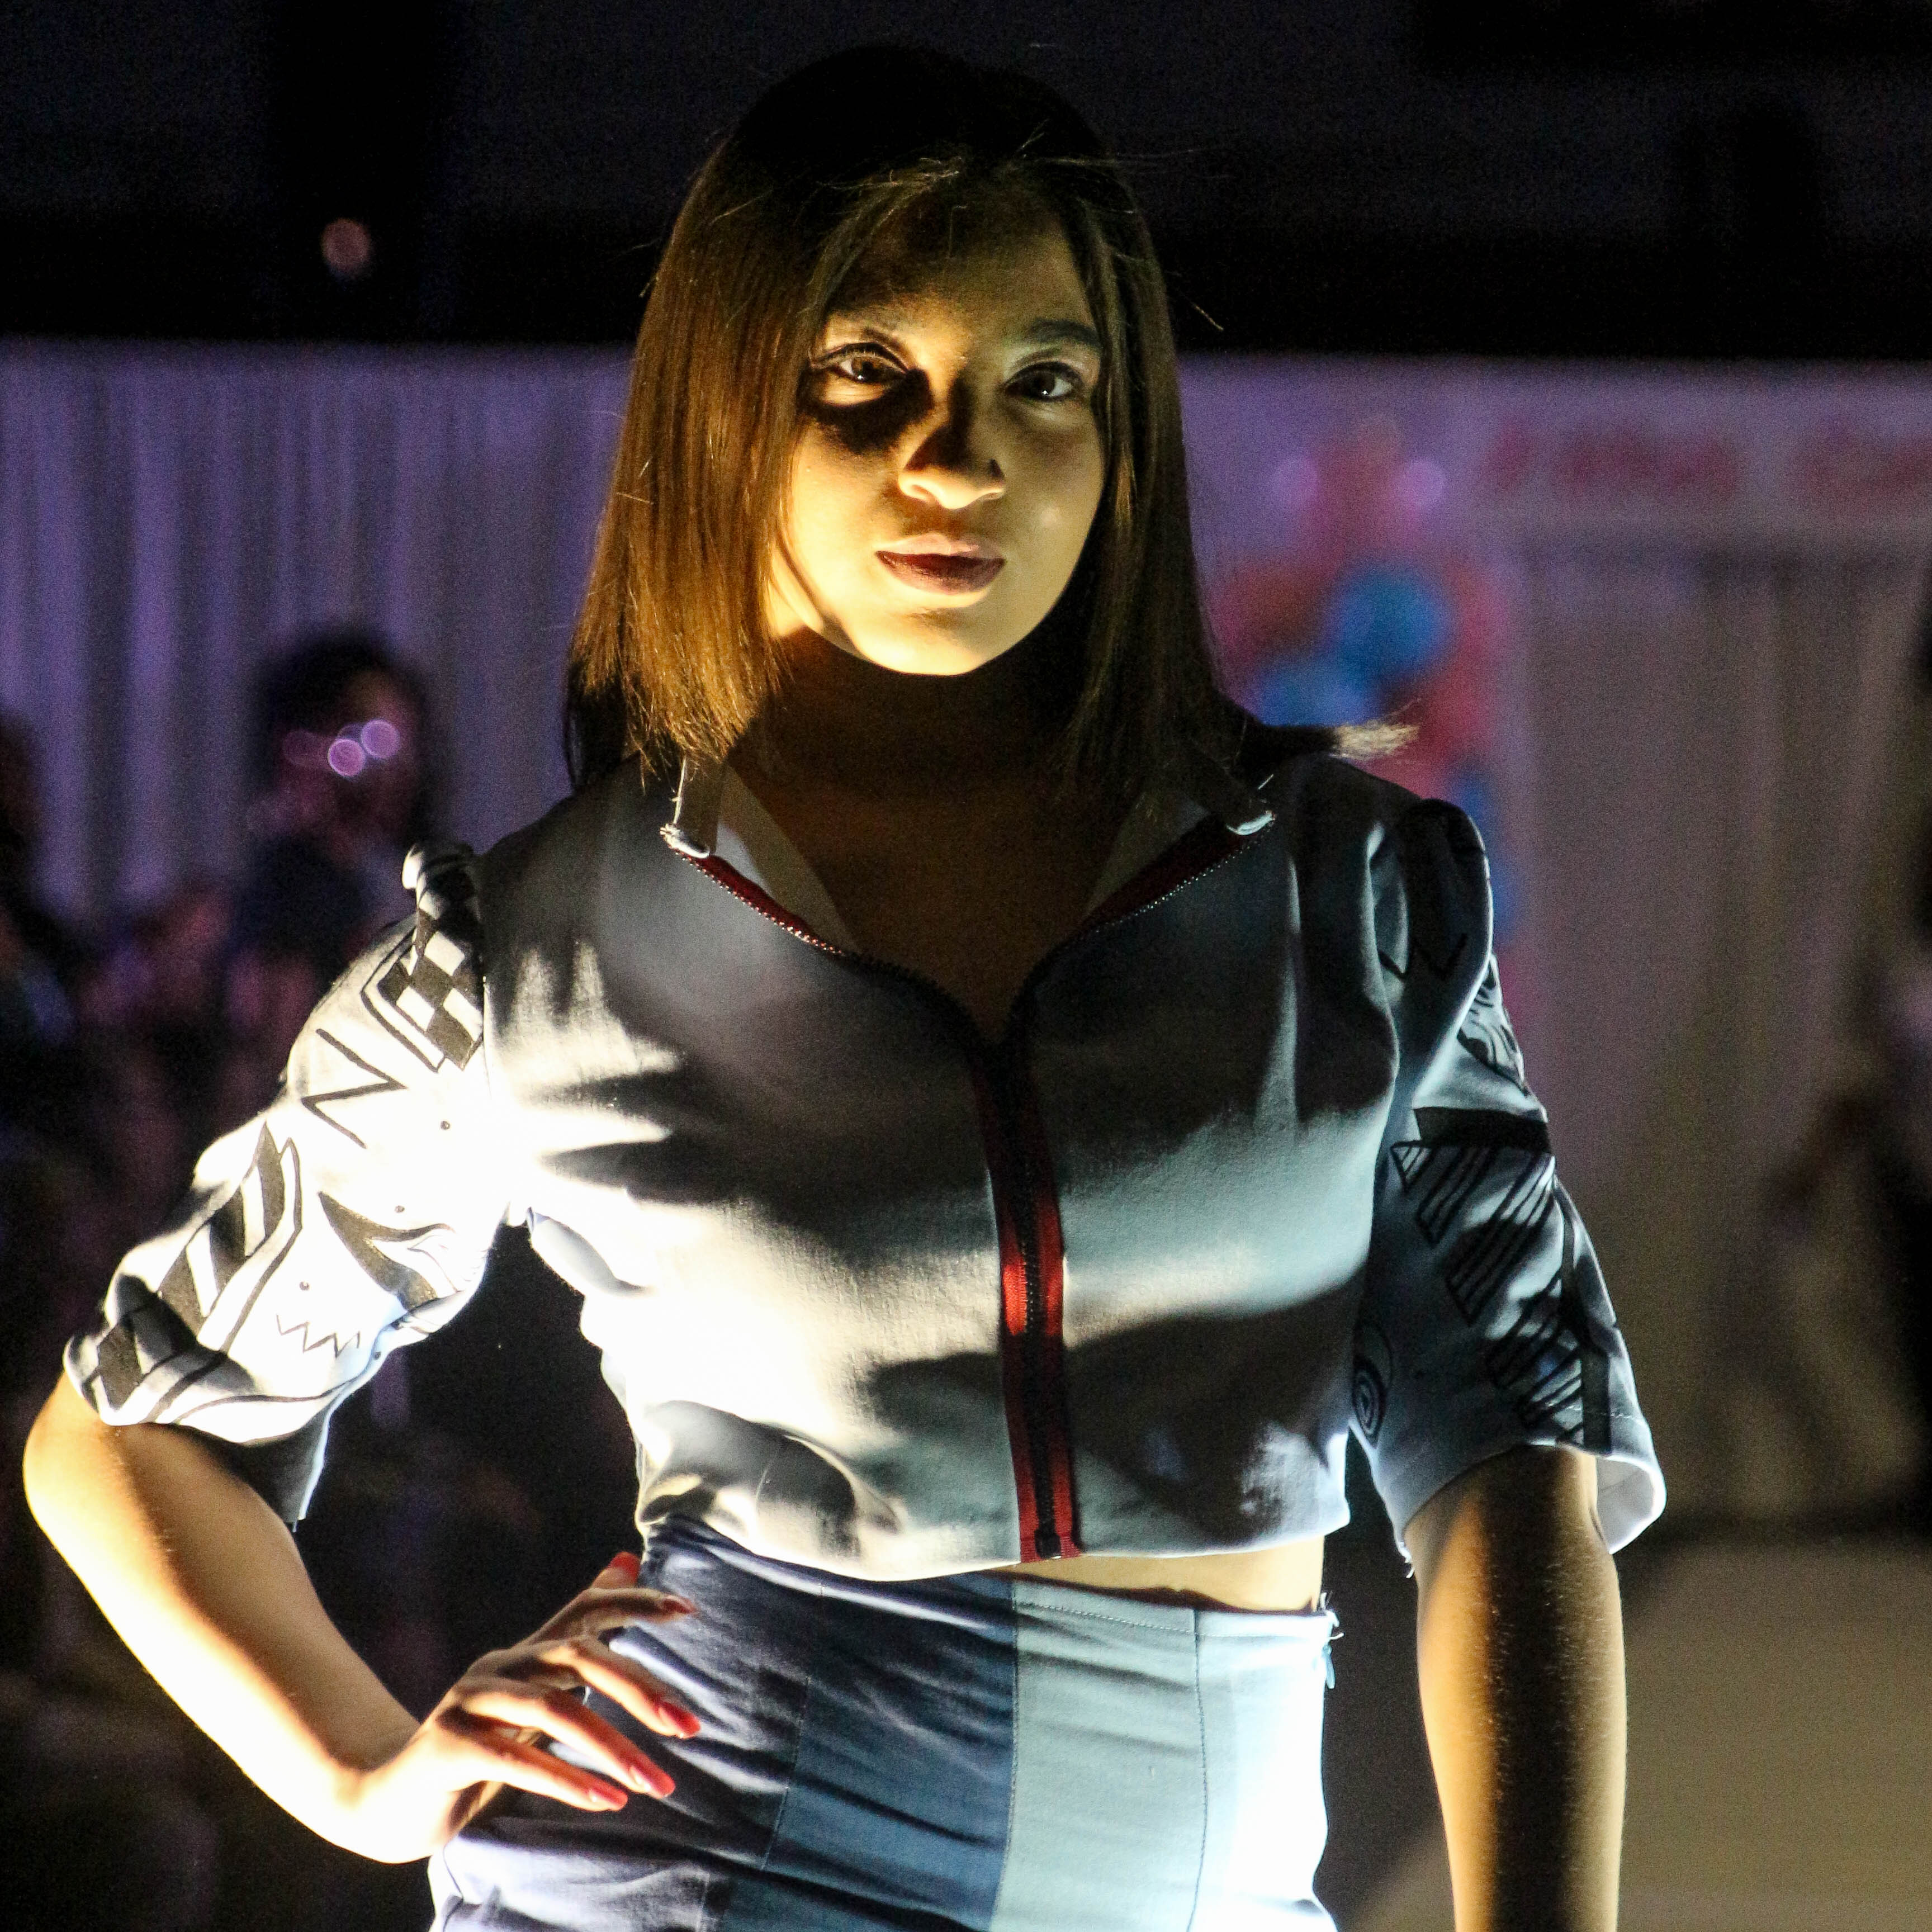 106 Fashion Competition Showcases Nccu Designs Campus Echo Online